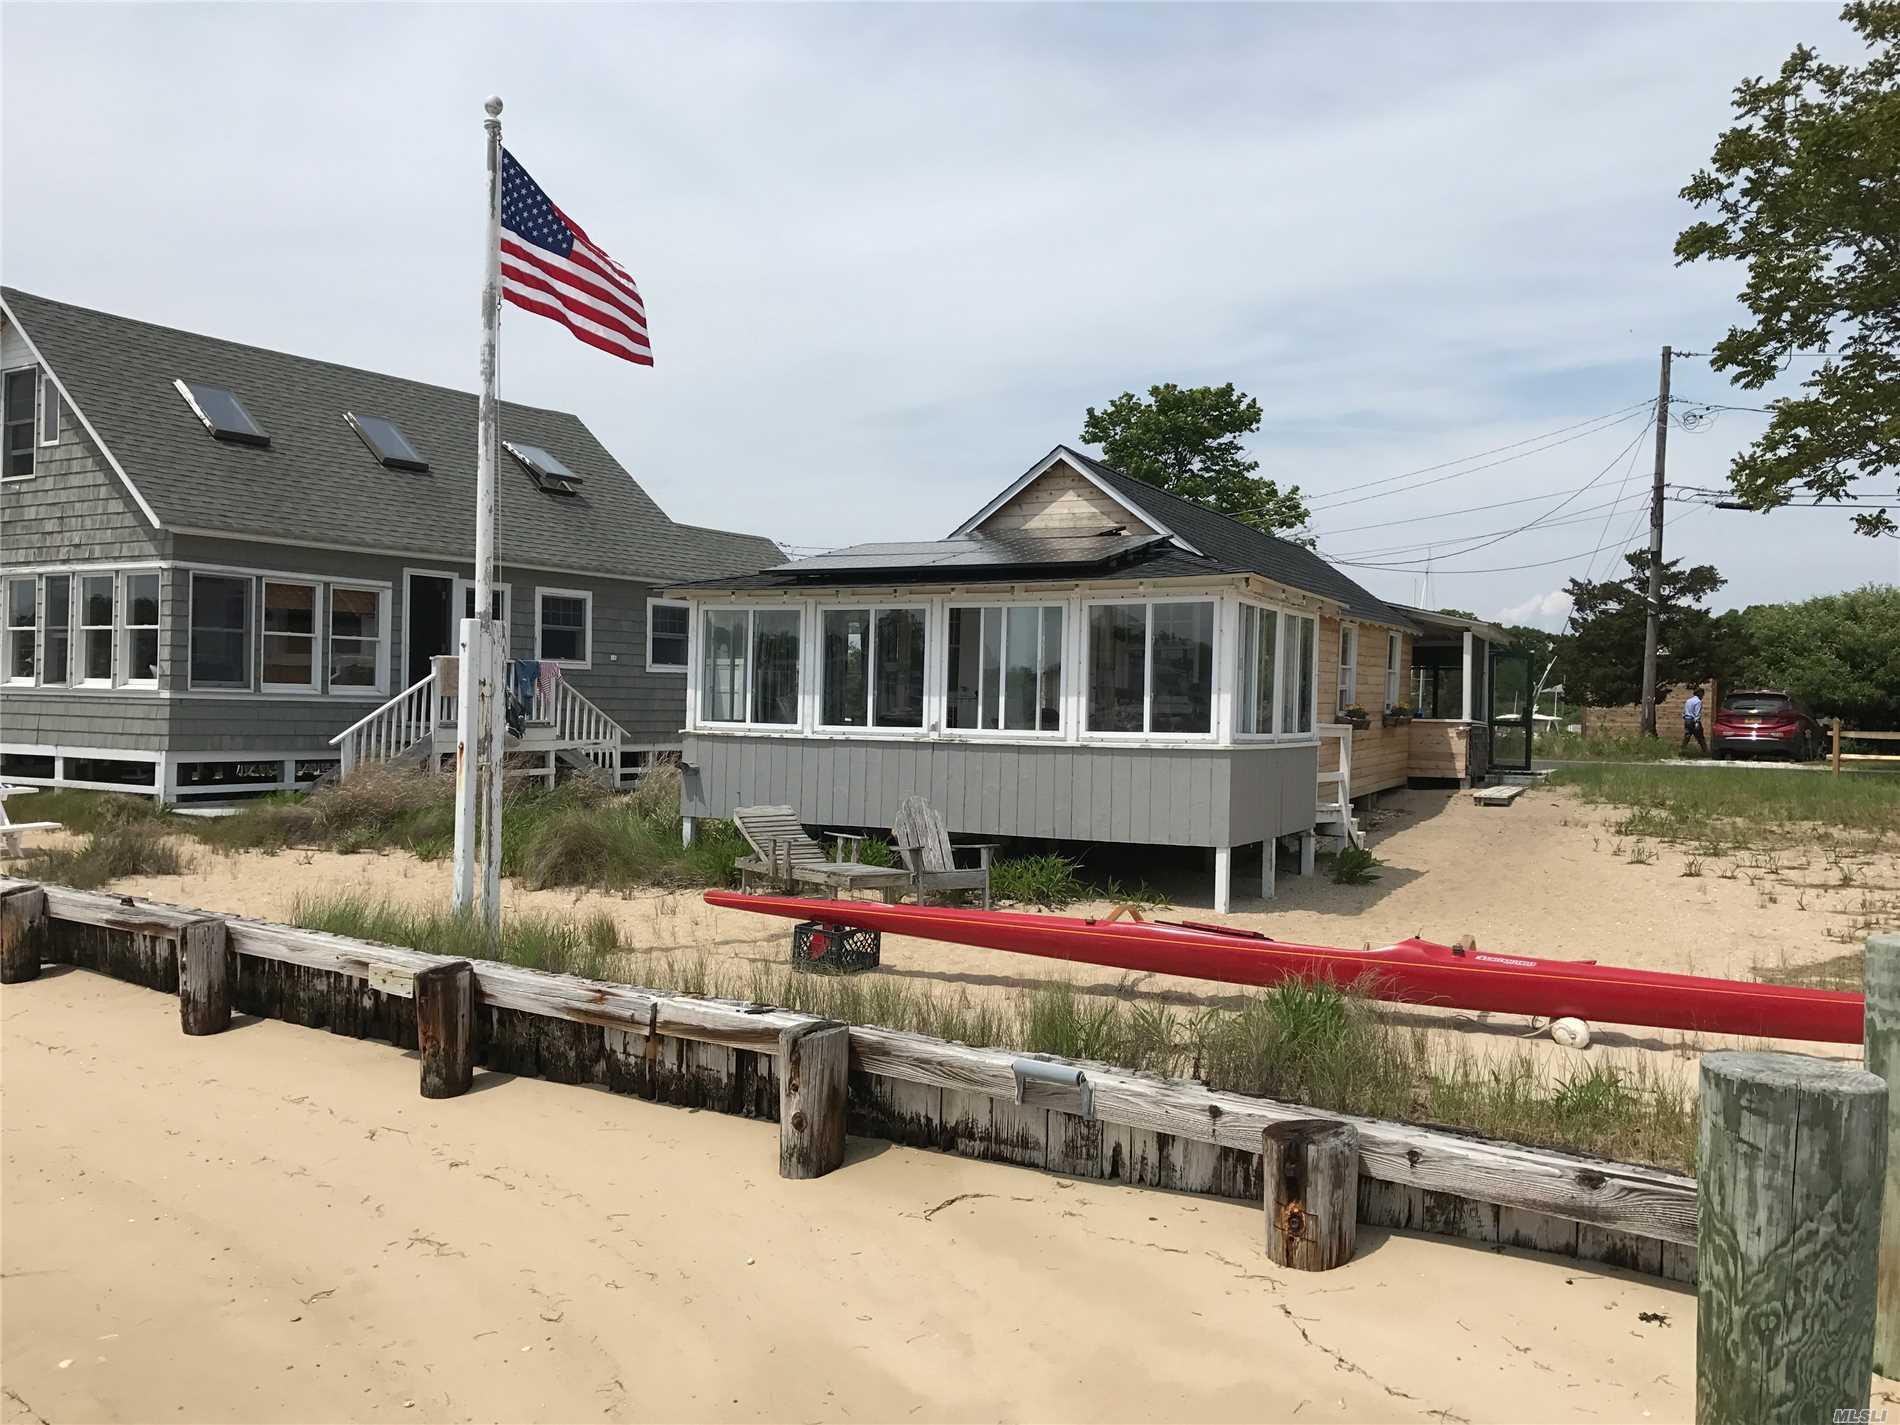 24 Beach Rd - Greenport, New York